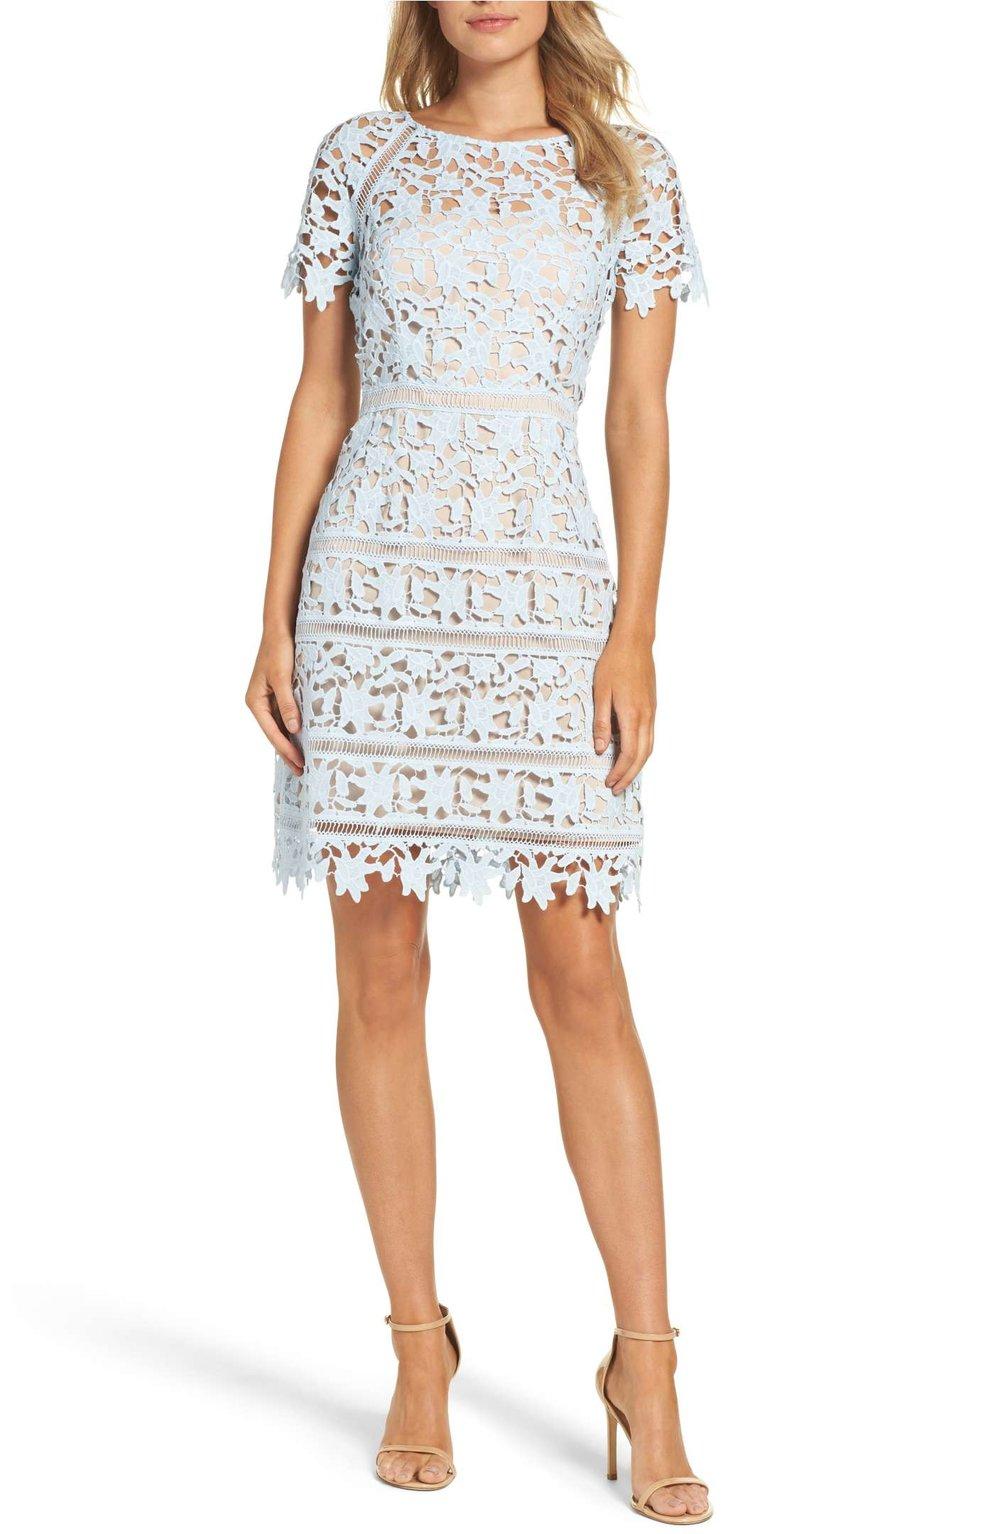 Crochet Dress  by Eliza J $178, Sizes 2-16